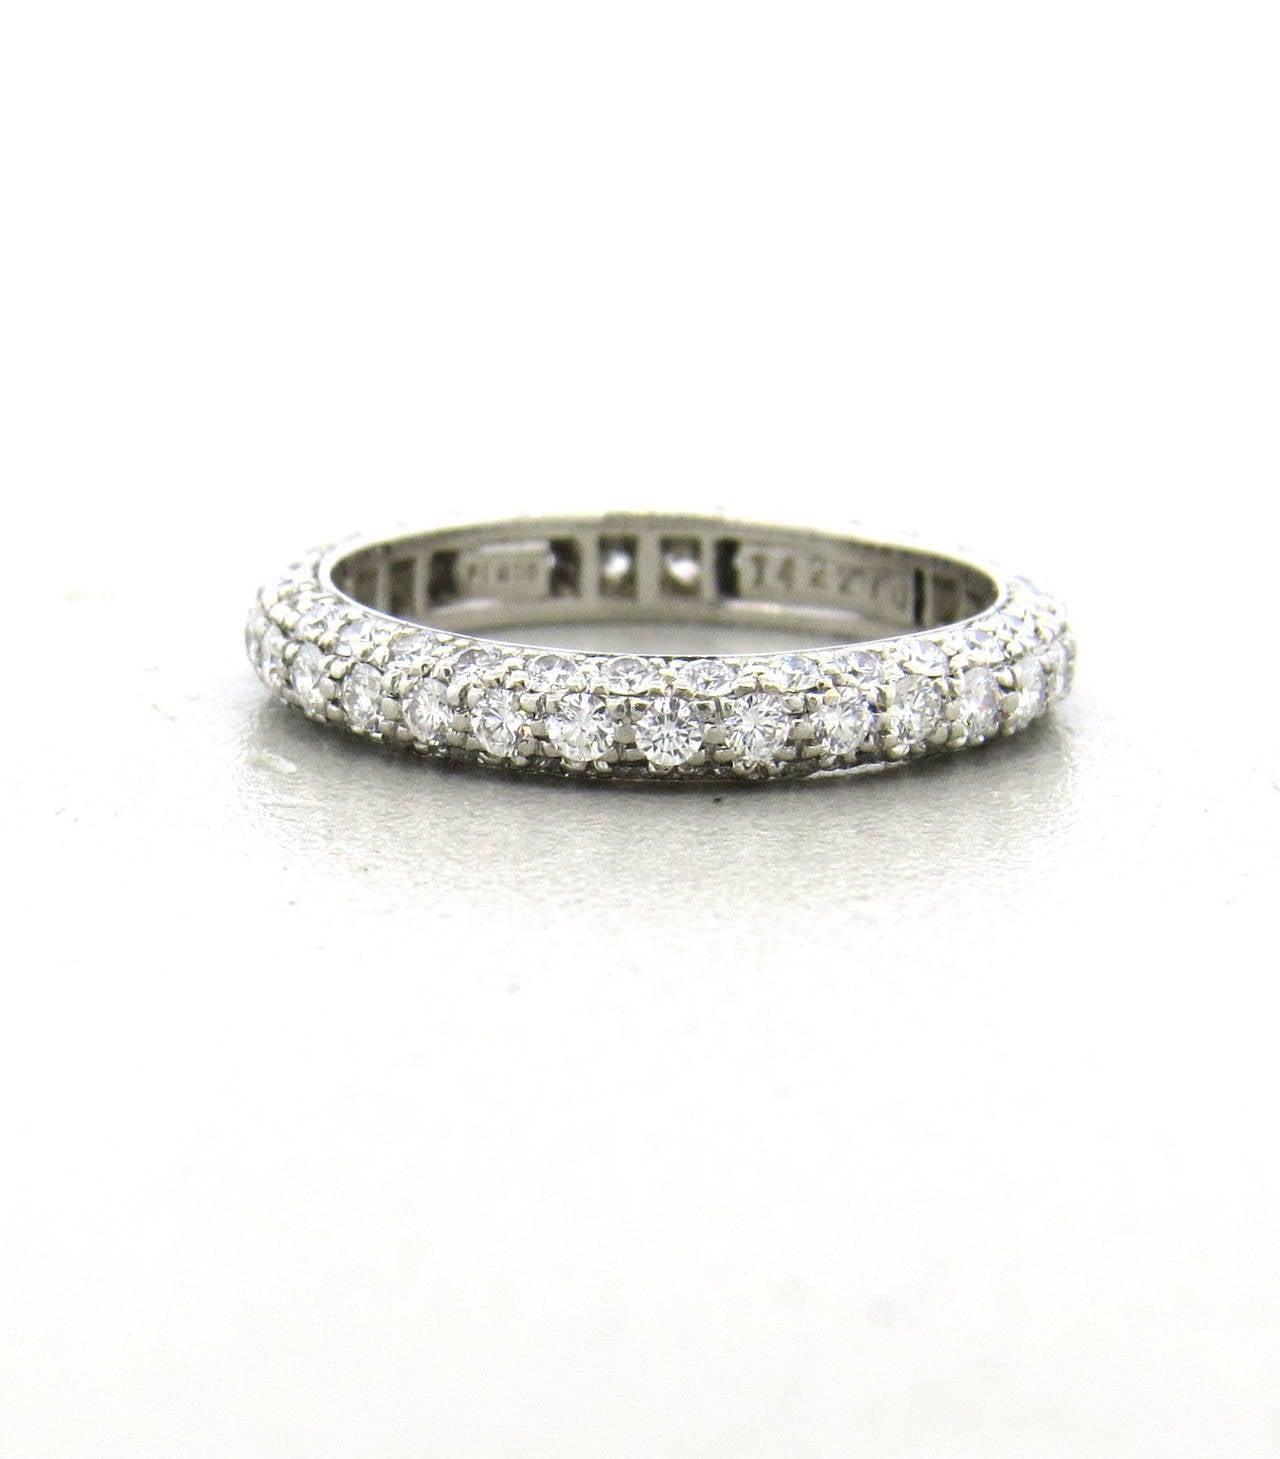 harry winston platinum wedding band ring at 1stdibs